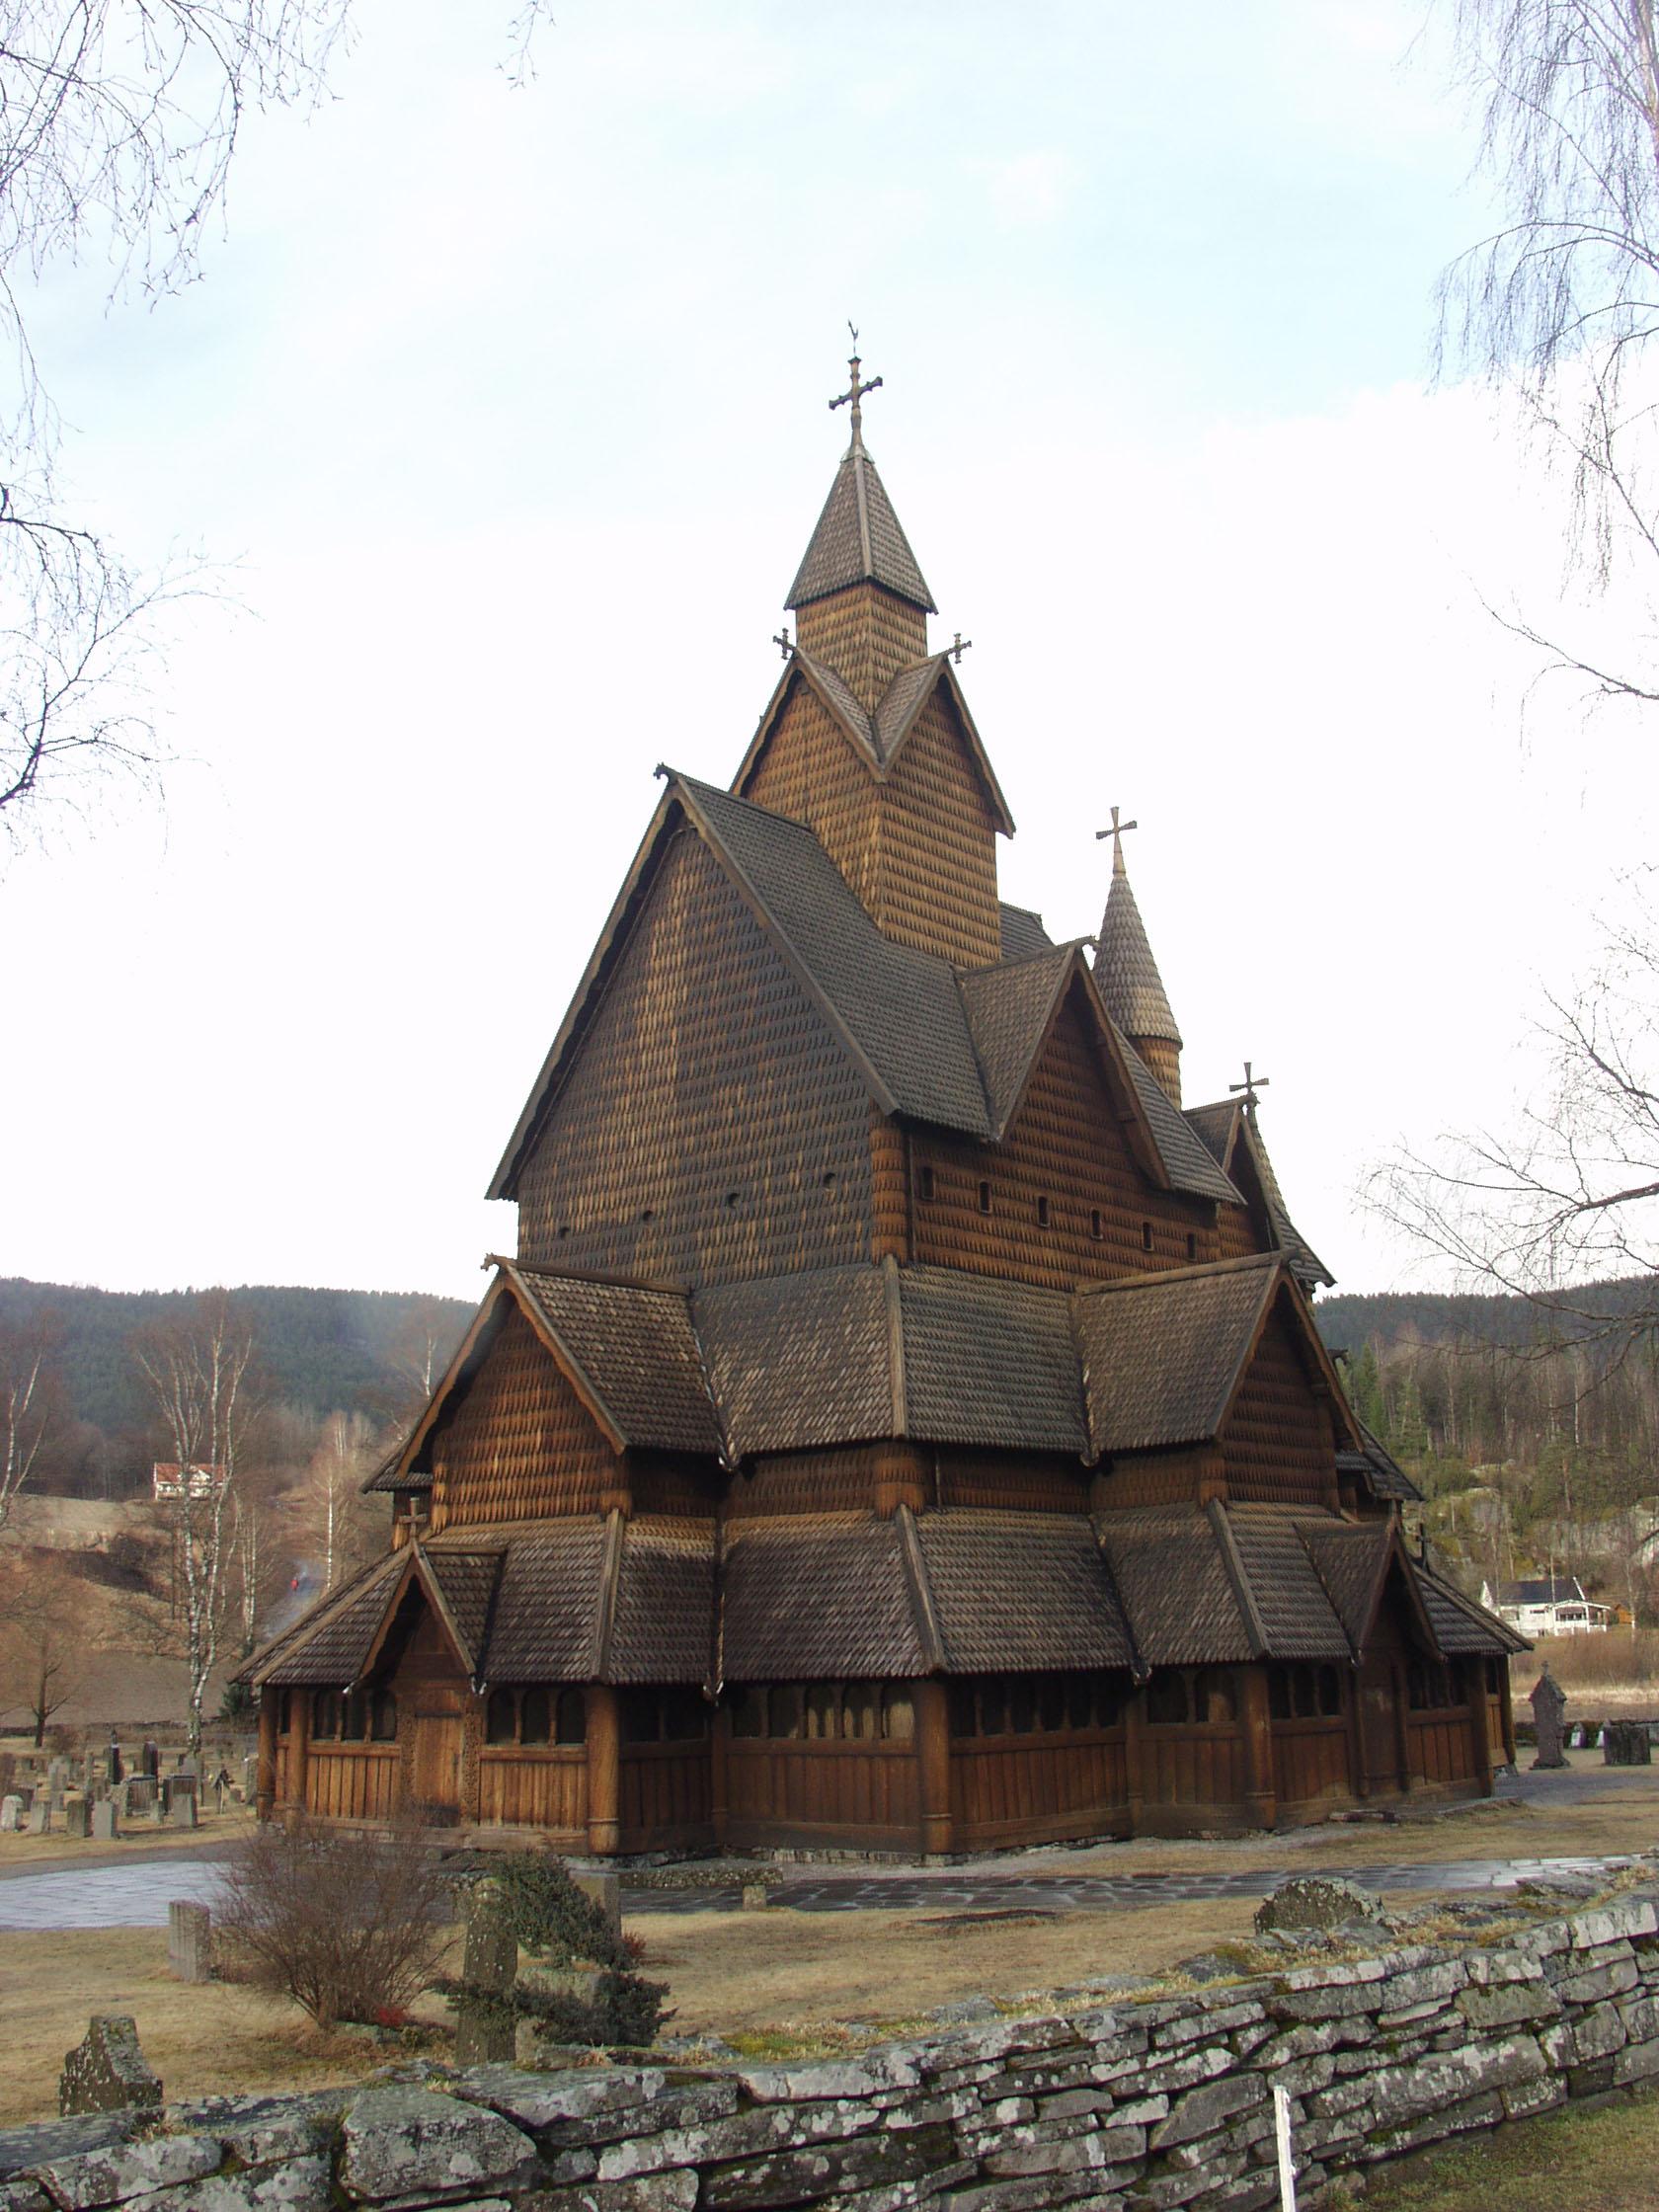 stavkirker i norge kart Liste over stavkirker i Norge   Wikiwand stavkirker i norge kart